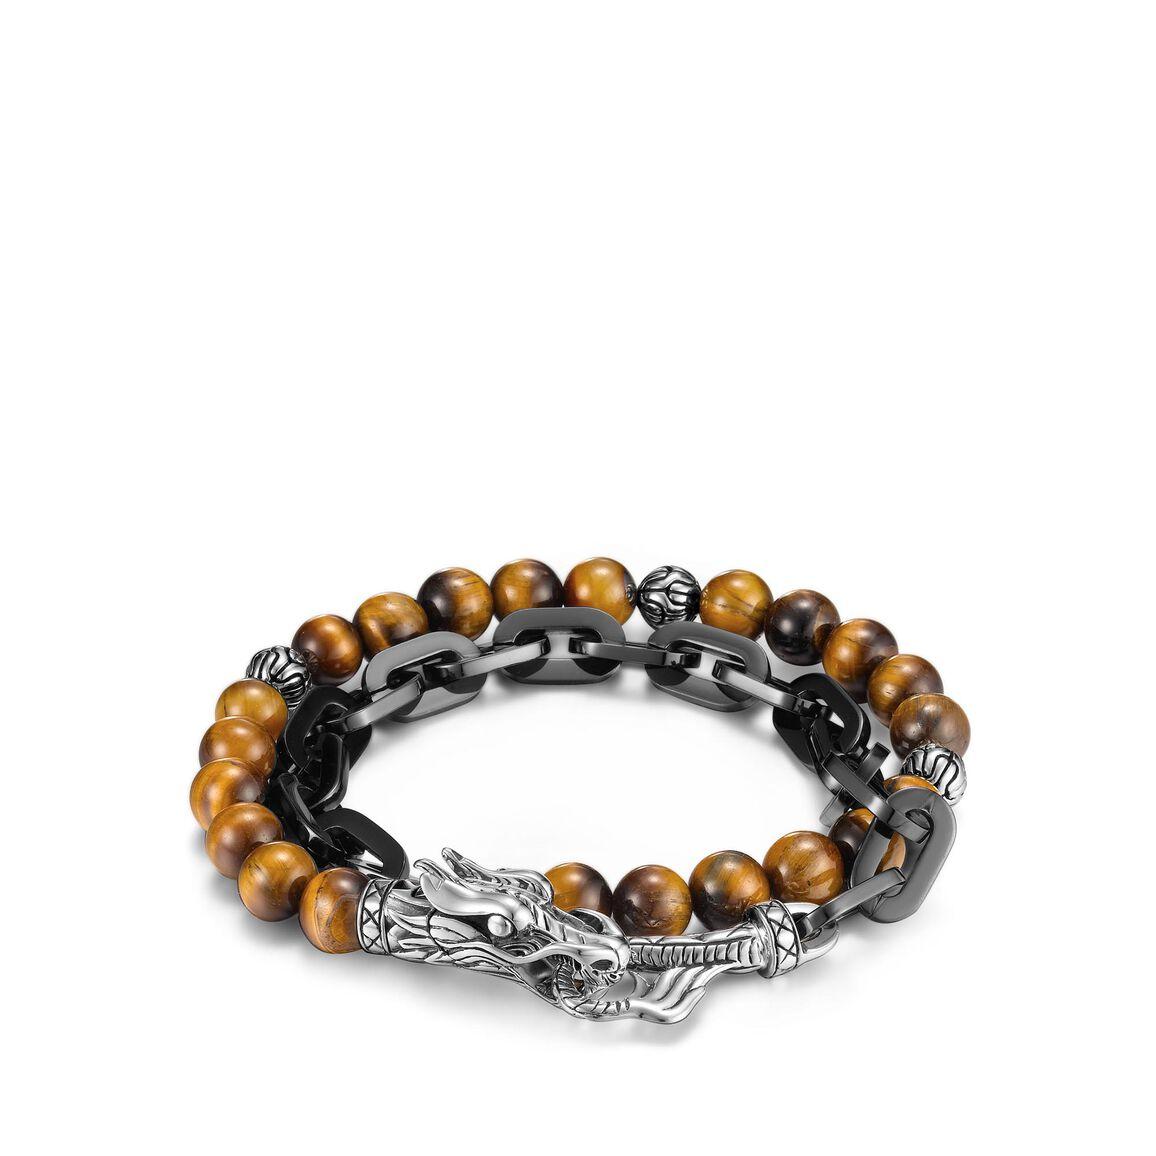 Legends Naga Wrap Bracelet, Silver, Stainless Steel, Gems